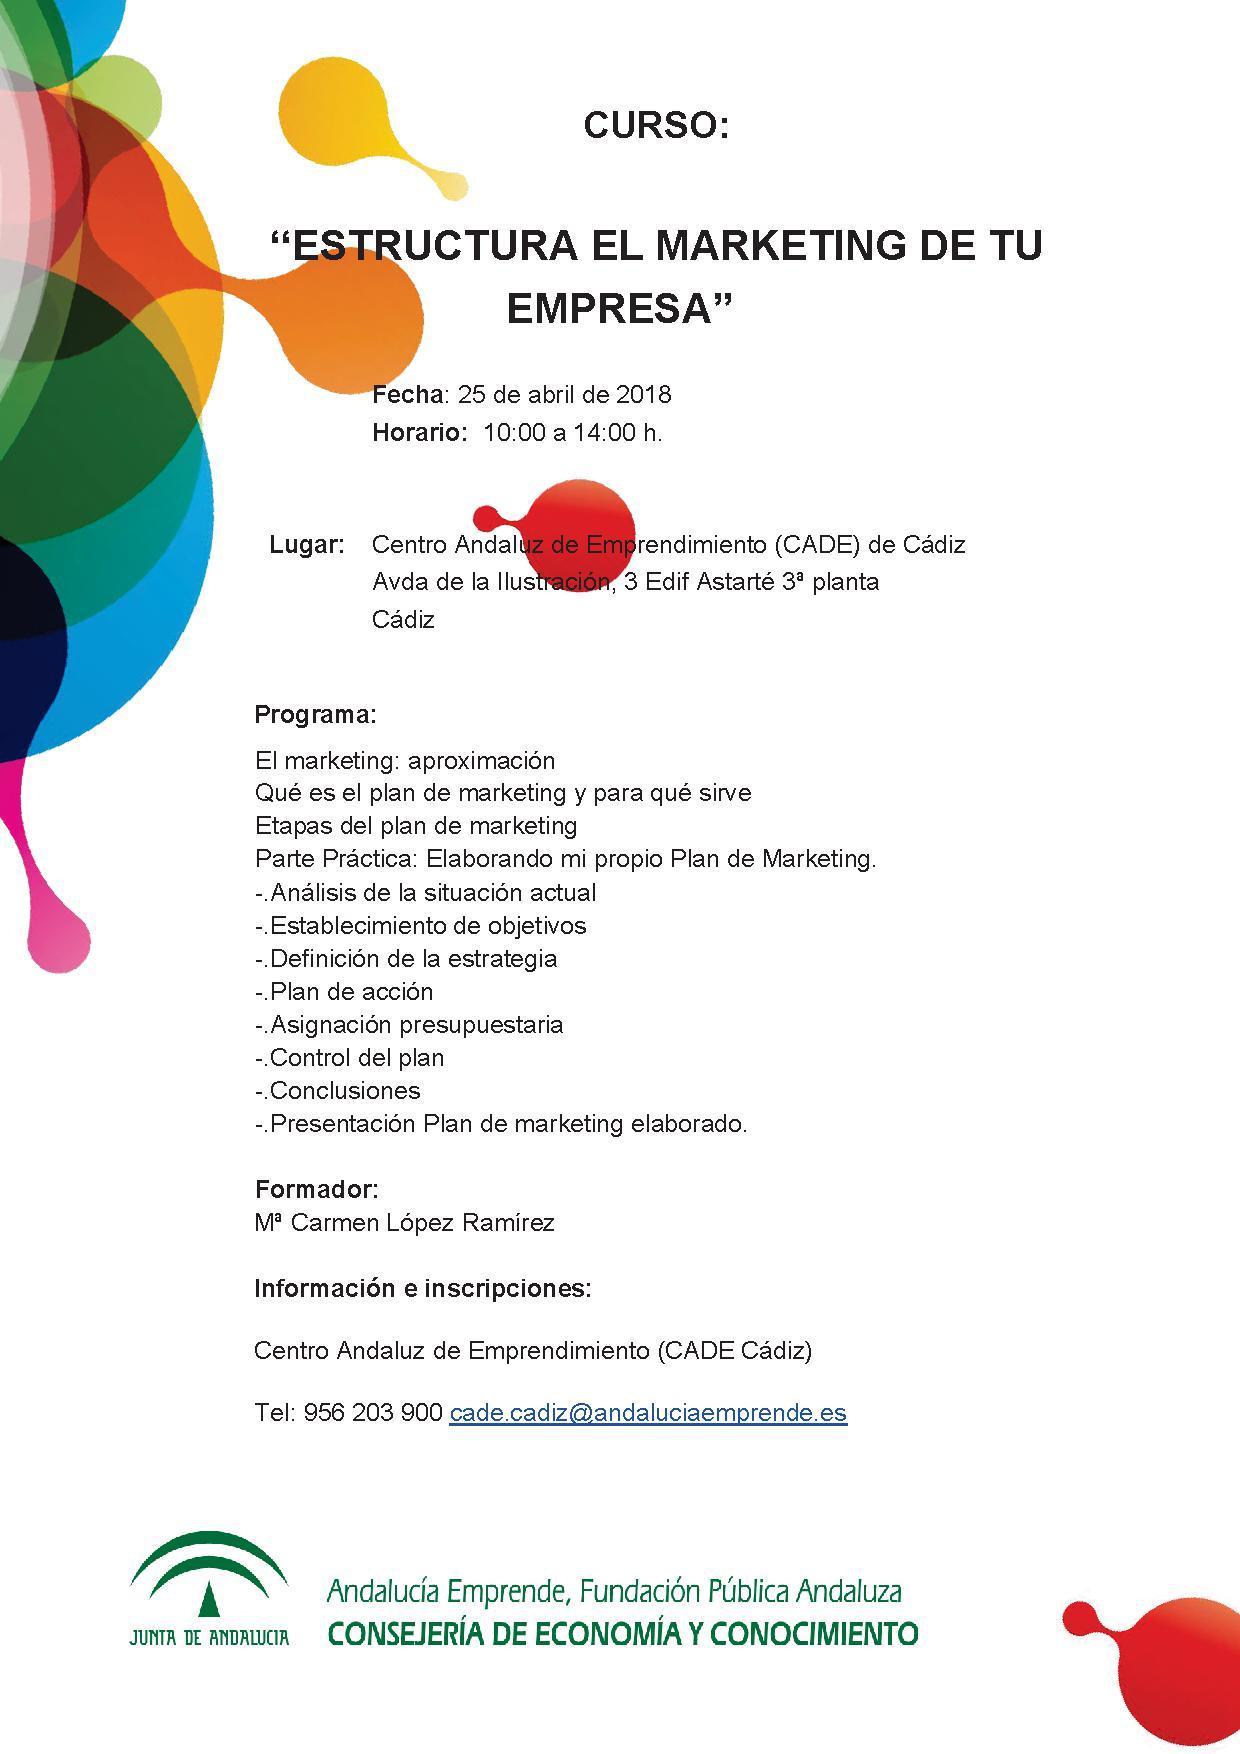 Estructura El Marketing De Tu Empresa Andalucía Emprende